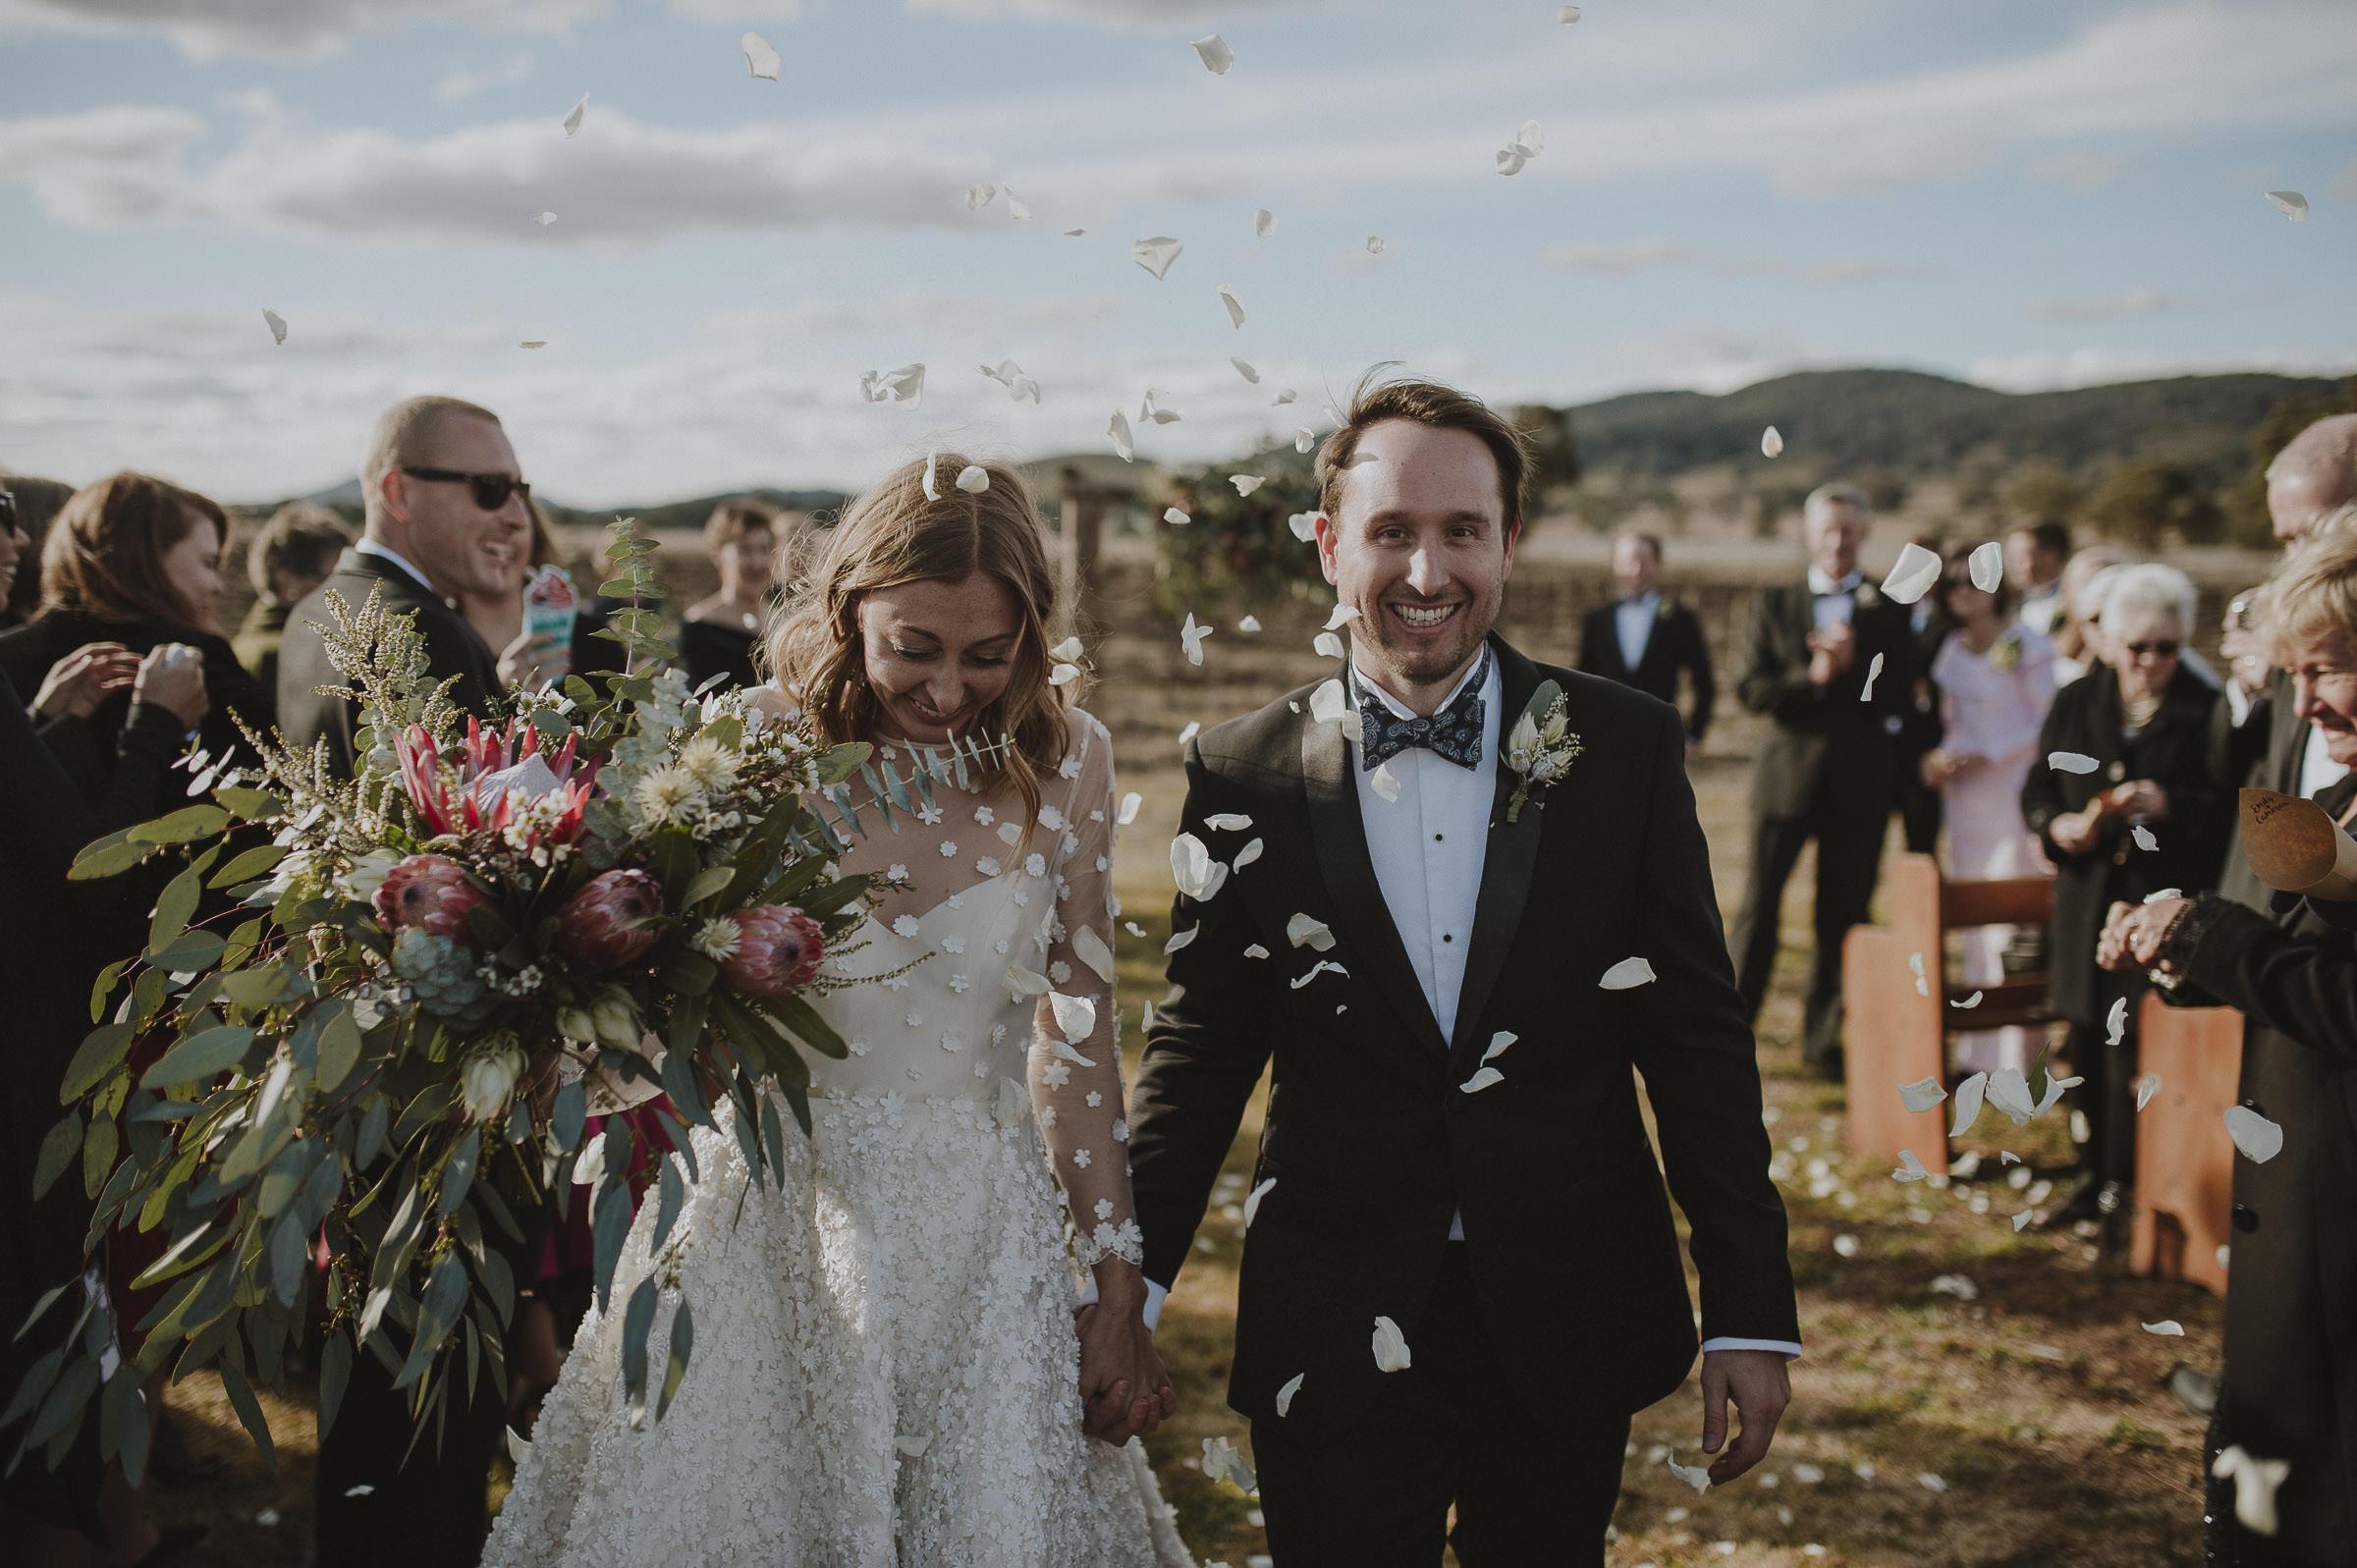 Emily_Skewesy_Mudgee_Wedding_Blog-16.jpg